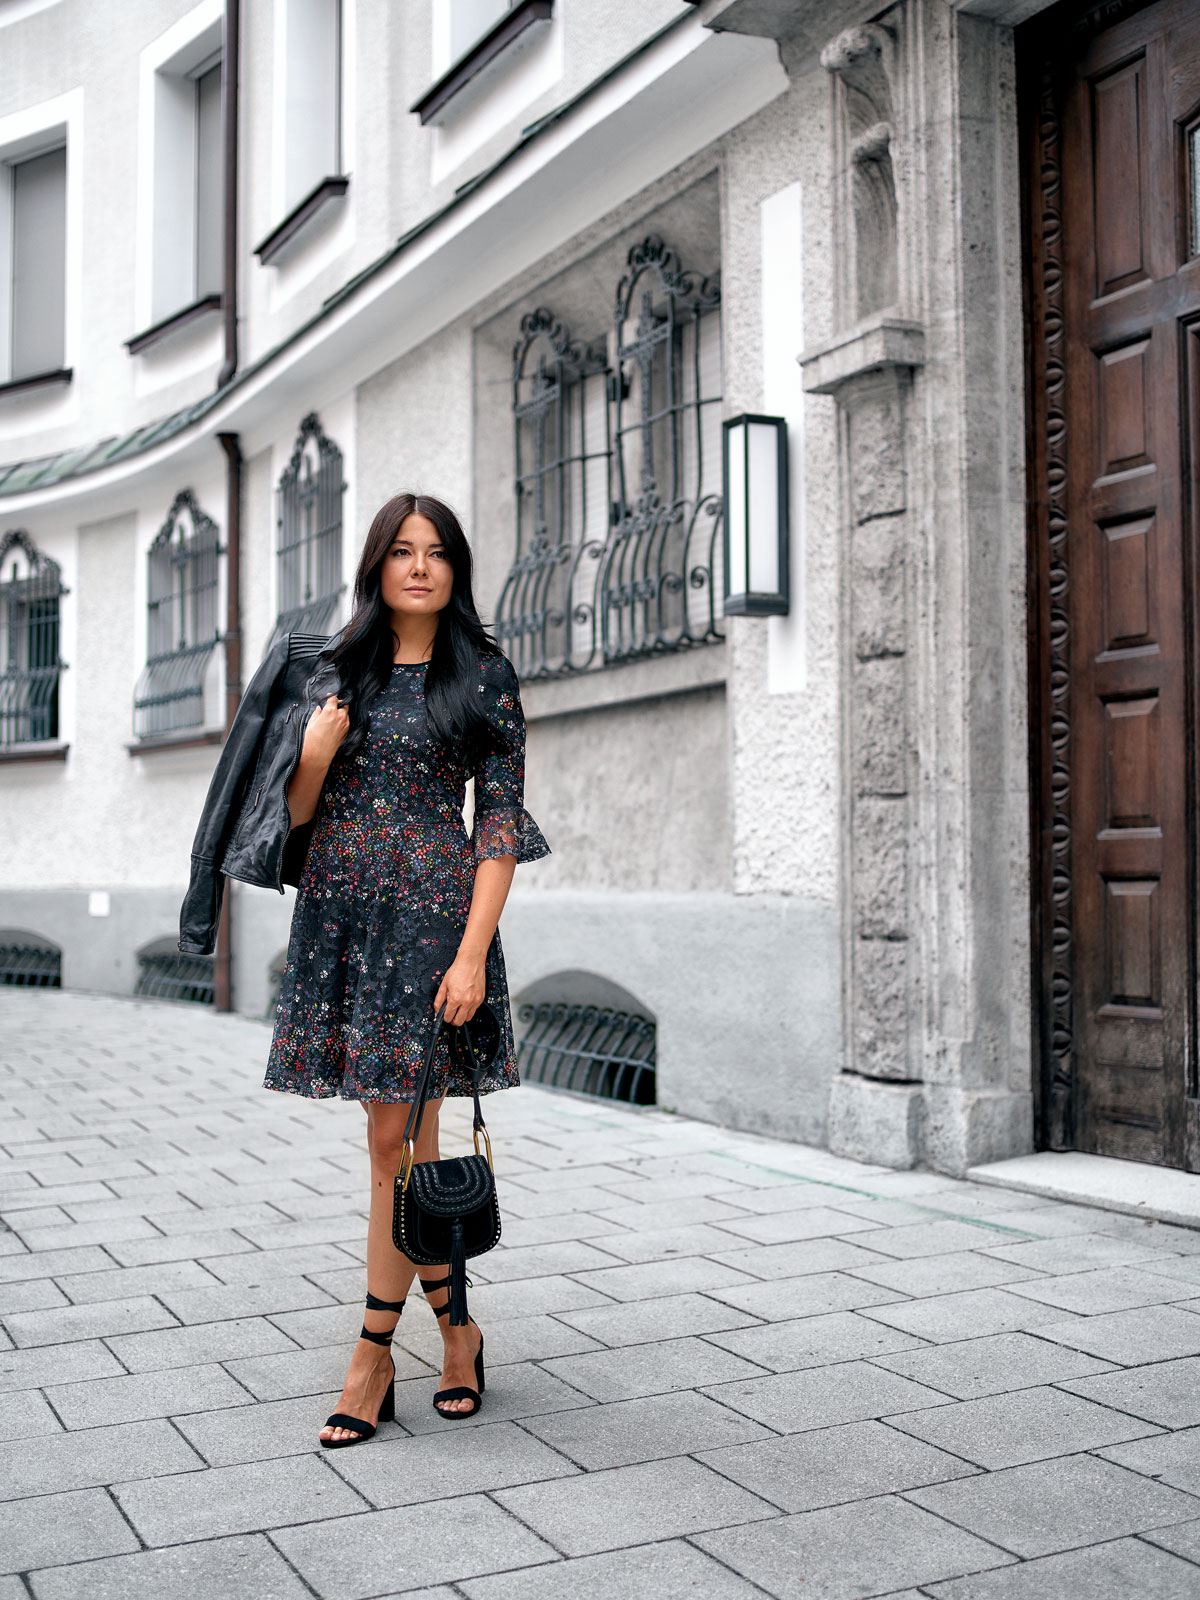 fashionambit-fashionblog-muenchen-modeblog-deutschland-blogger-modeblogger-fashionblogger-bloggerdeutschland-lifestyleblog-munich-style-blog-shopping